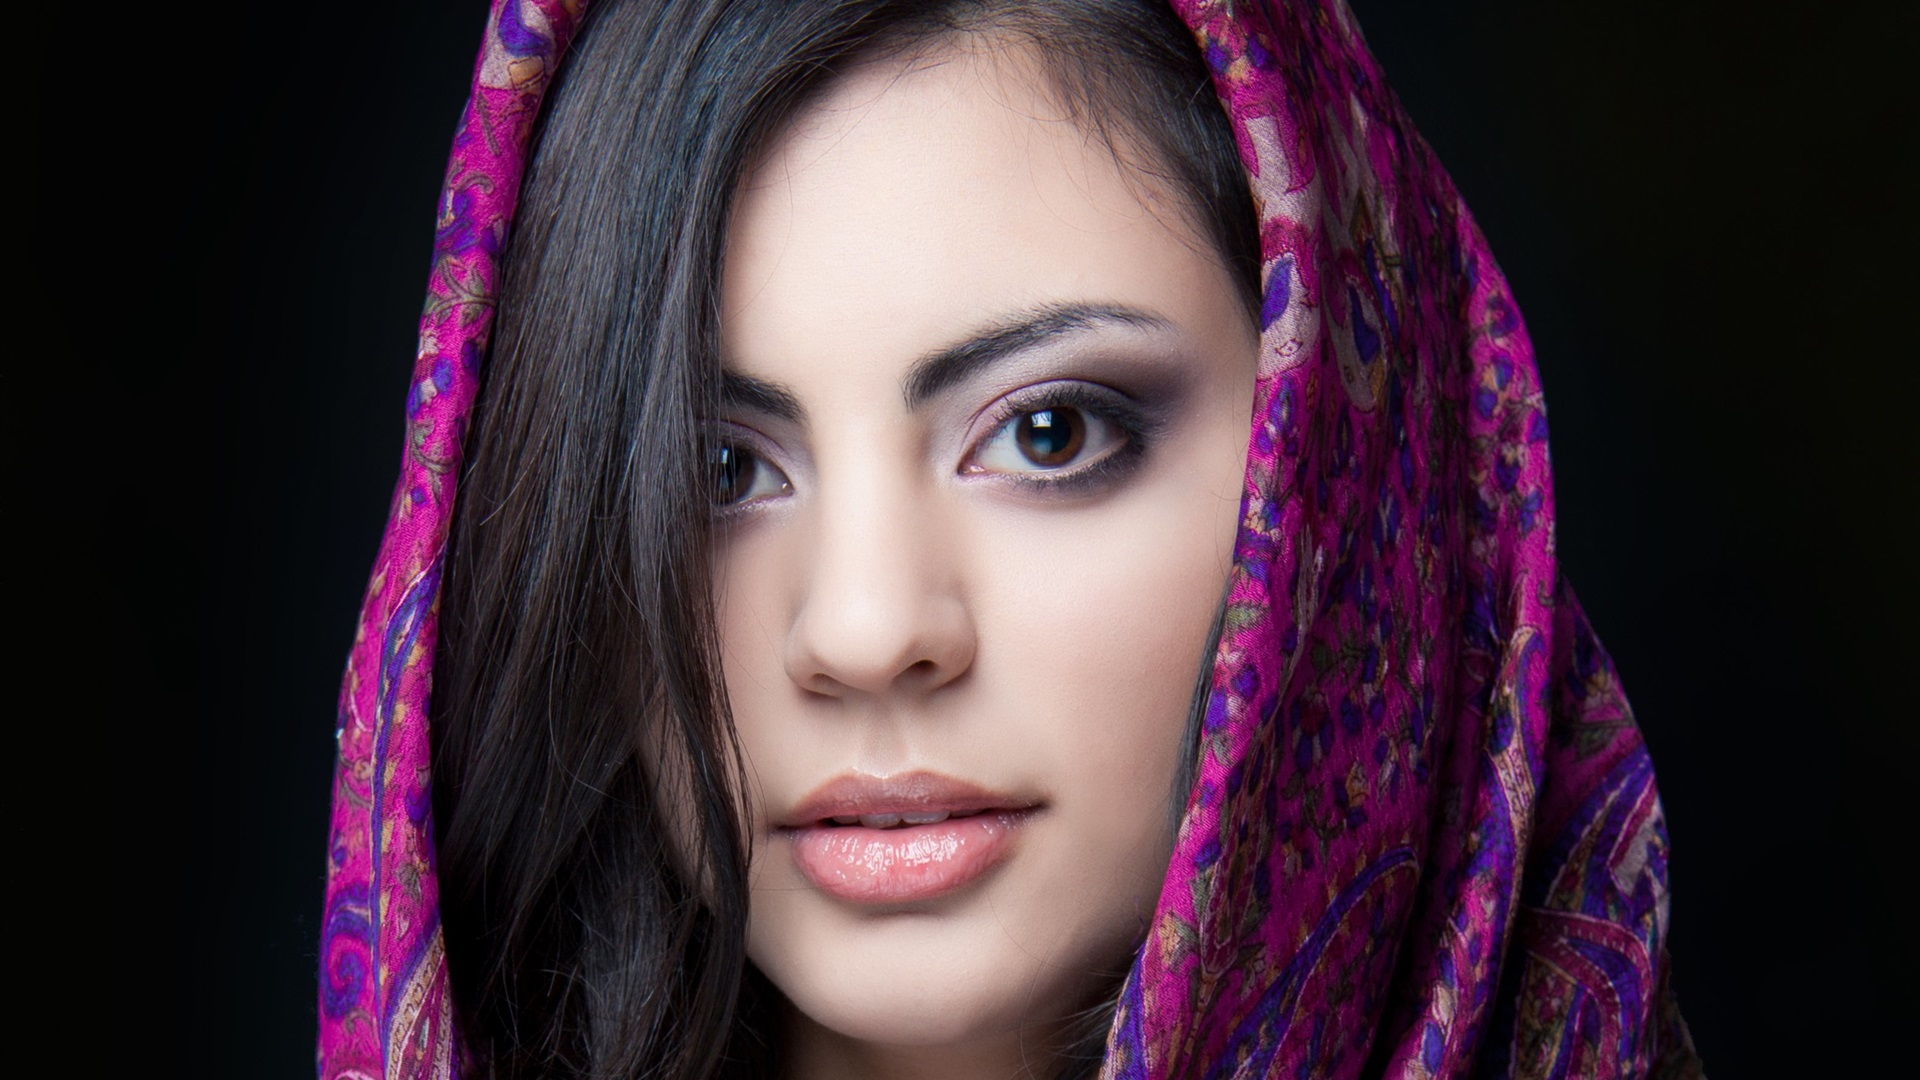 Wallpaper Beautiful Indian Girl Brown Eyes Face Scarf 2560x1600